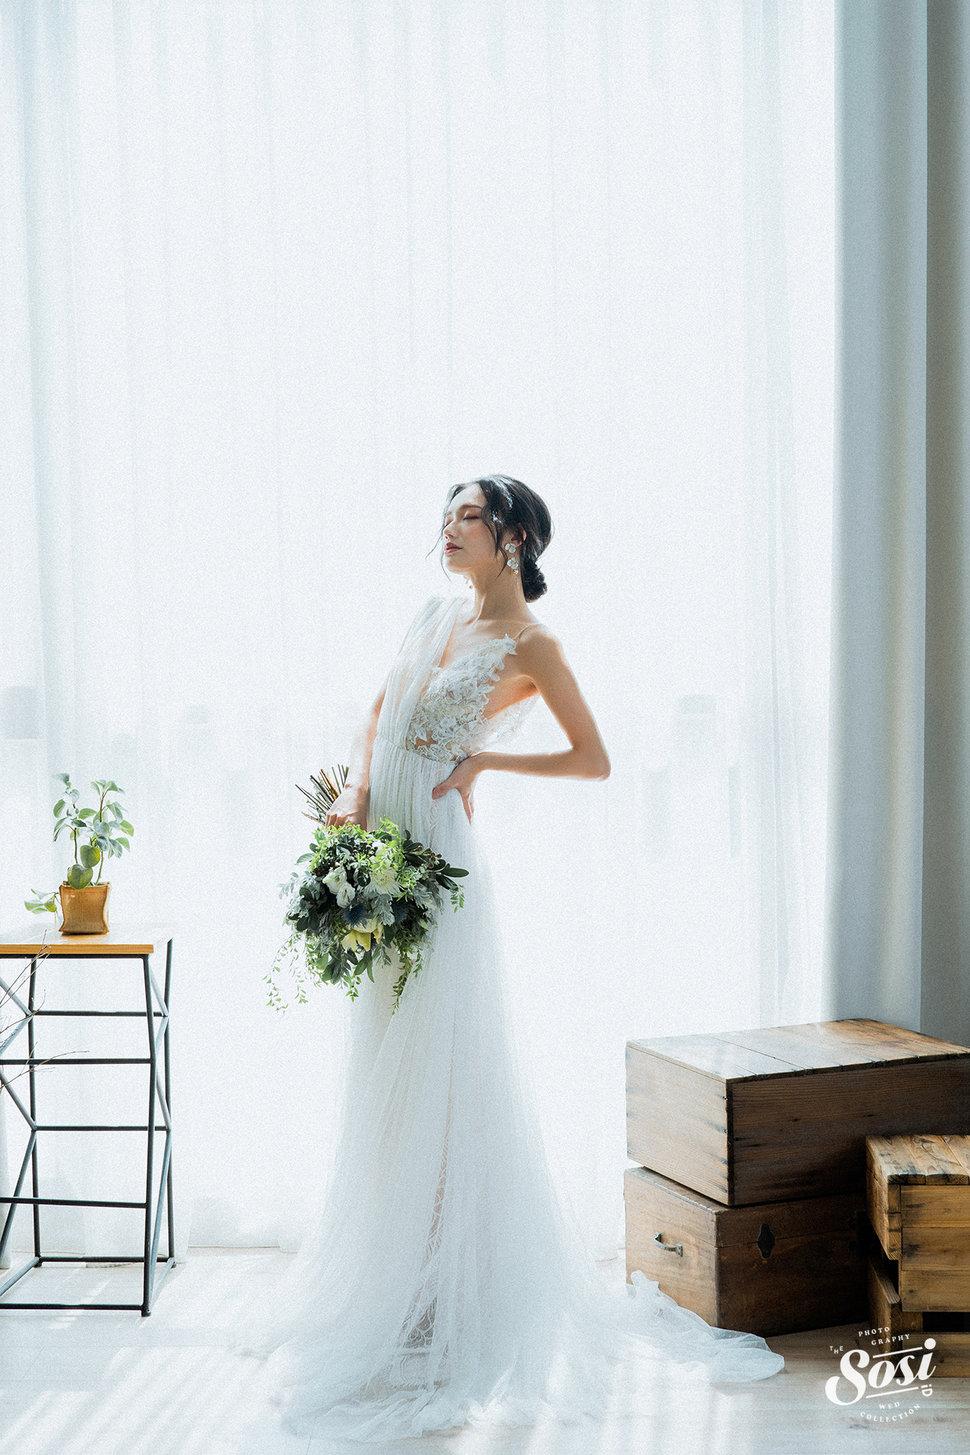 20191010-ERC00028 - sosi喜喜婚禮《結婚吧》